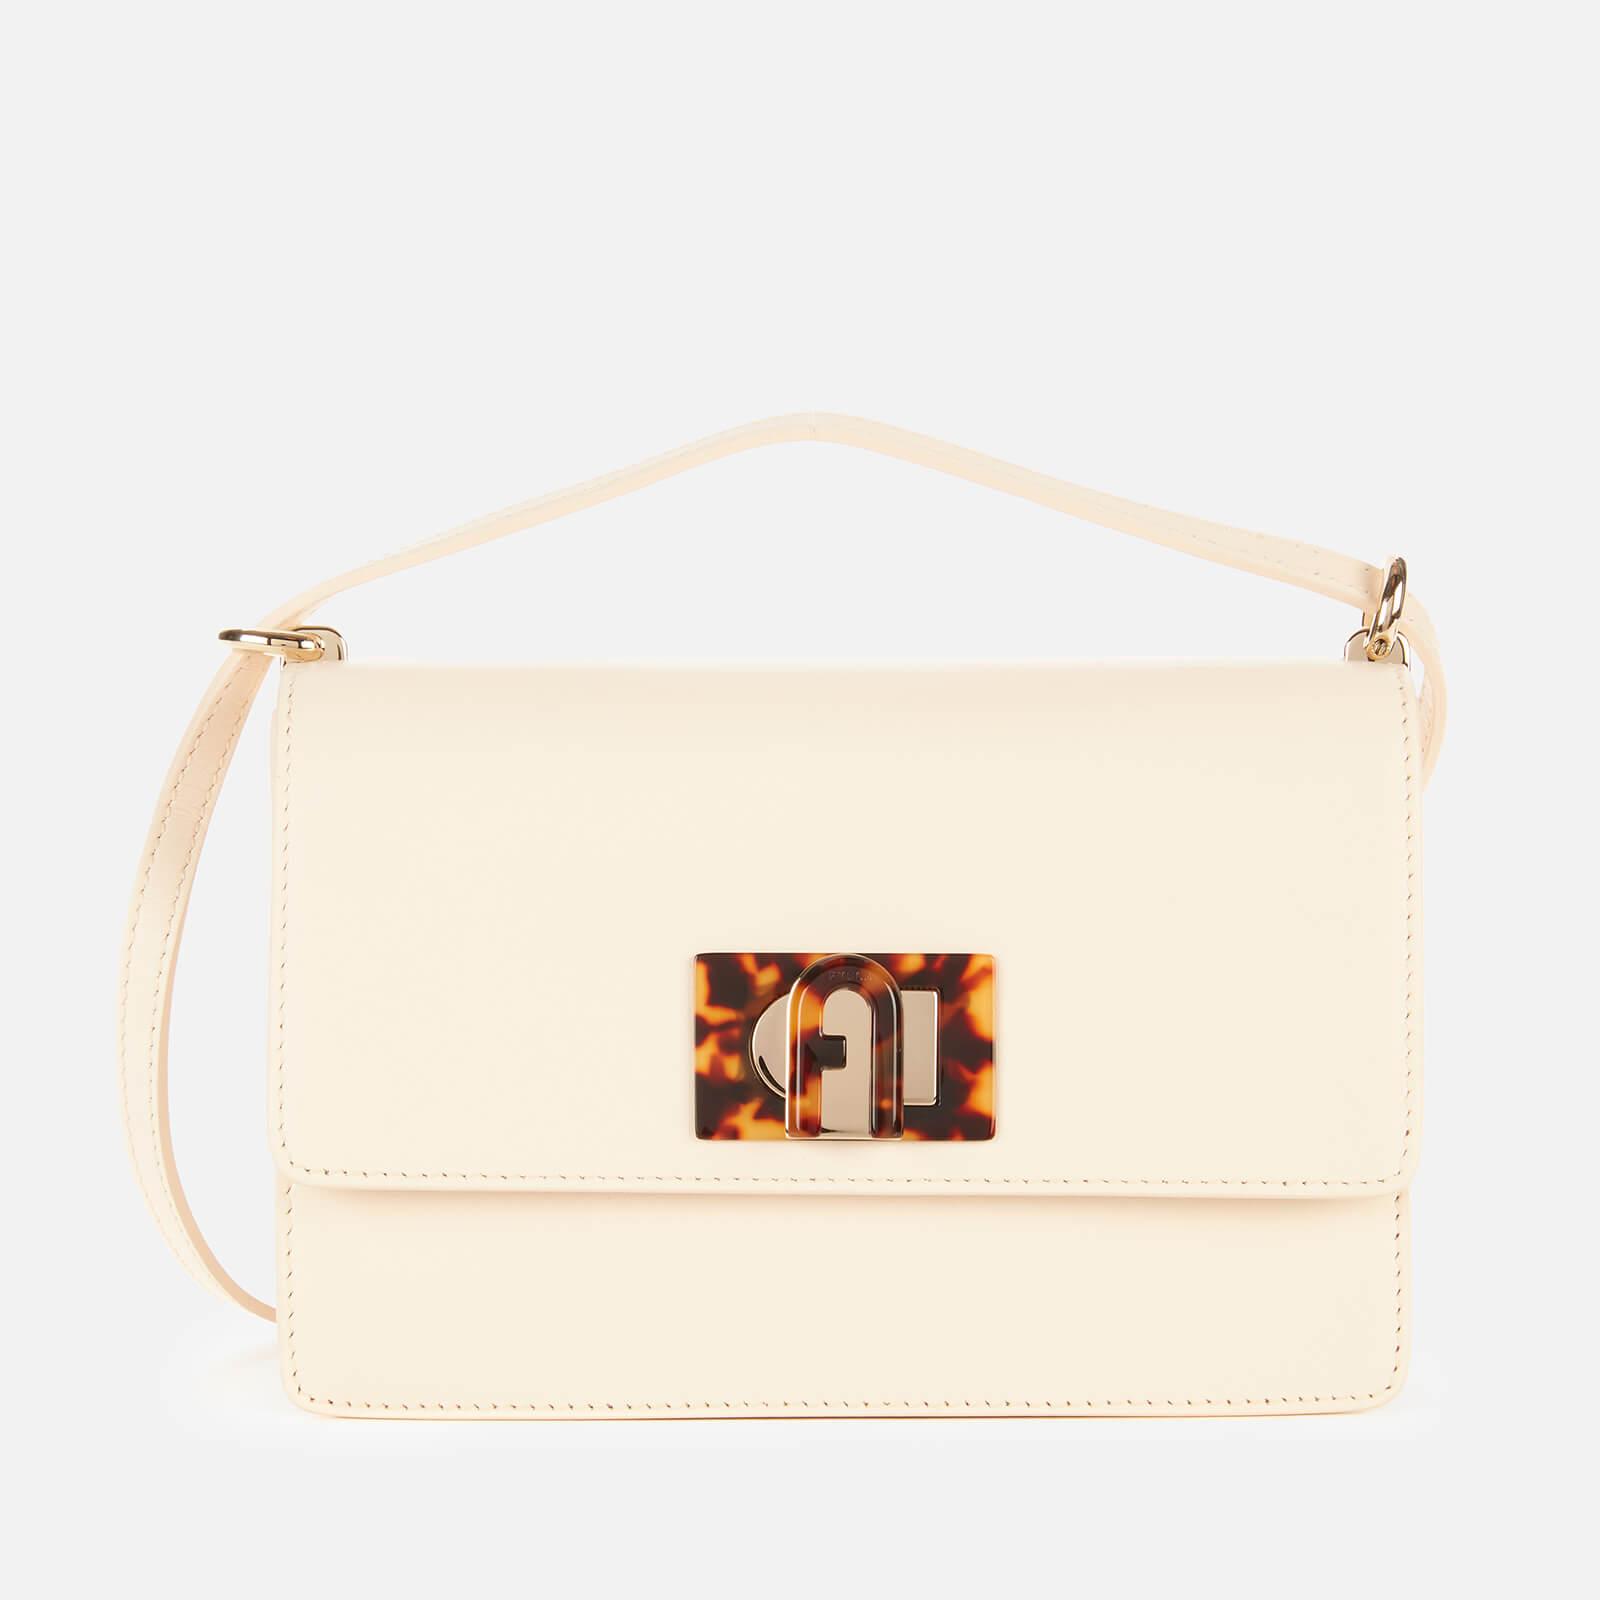 Furla Women's 1927 Mini Cross Body Bag 20 - Cream